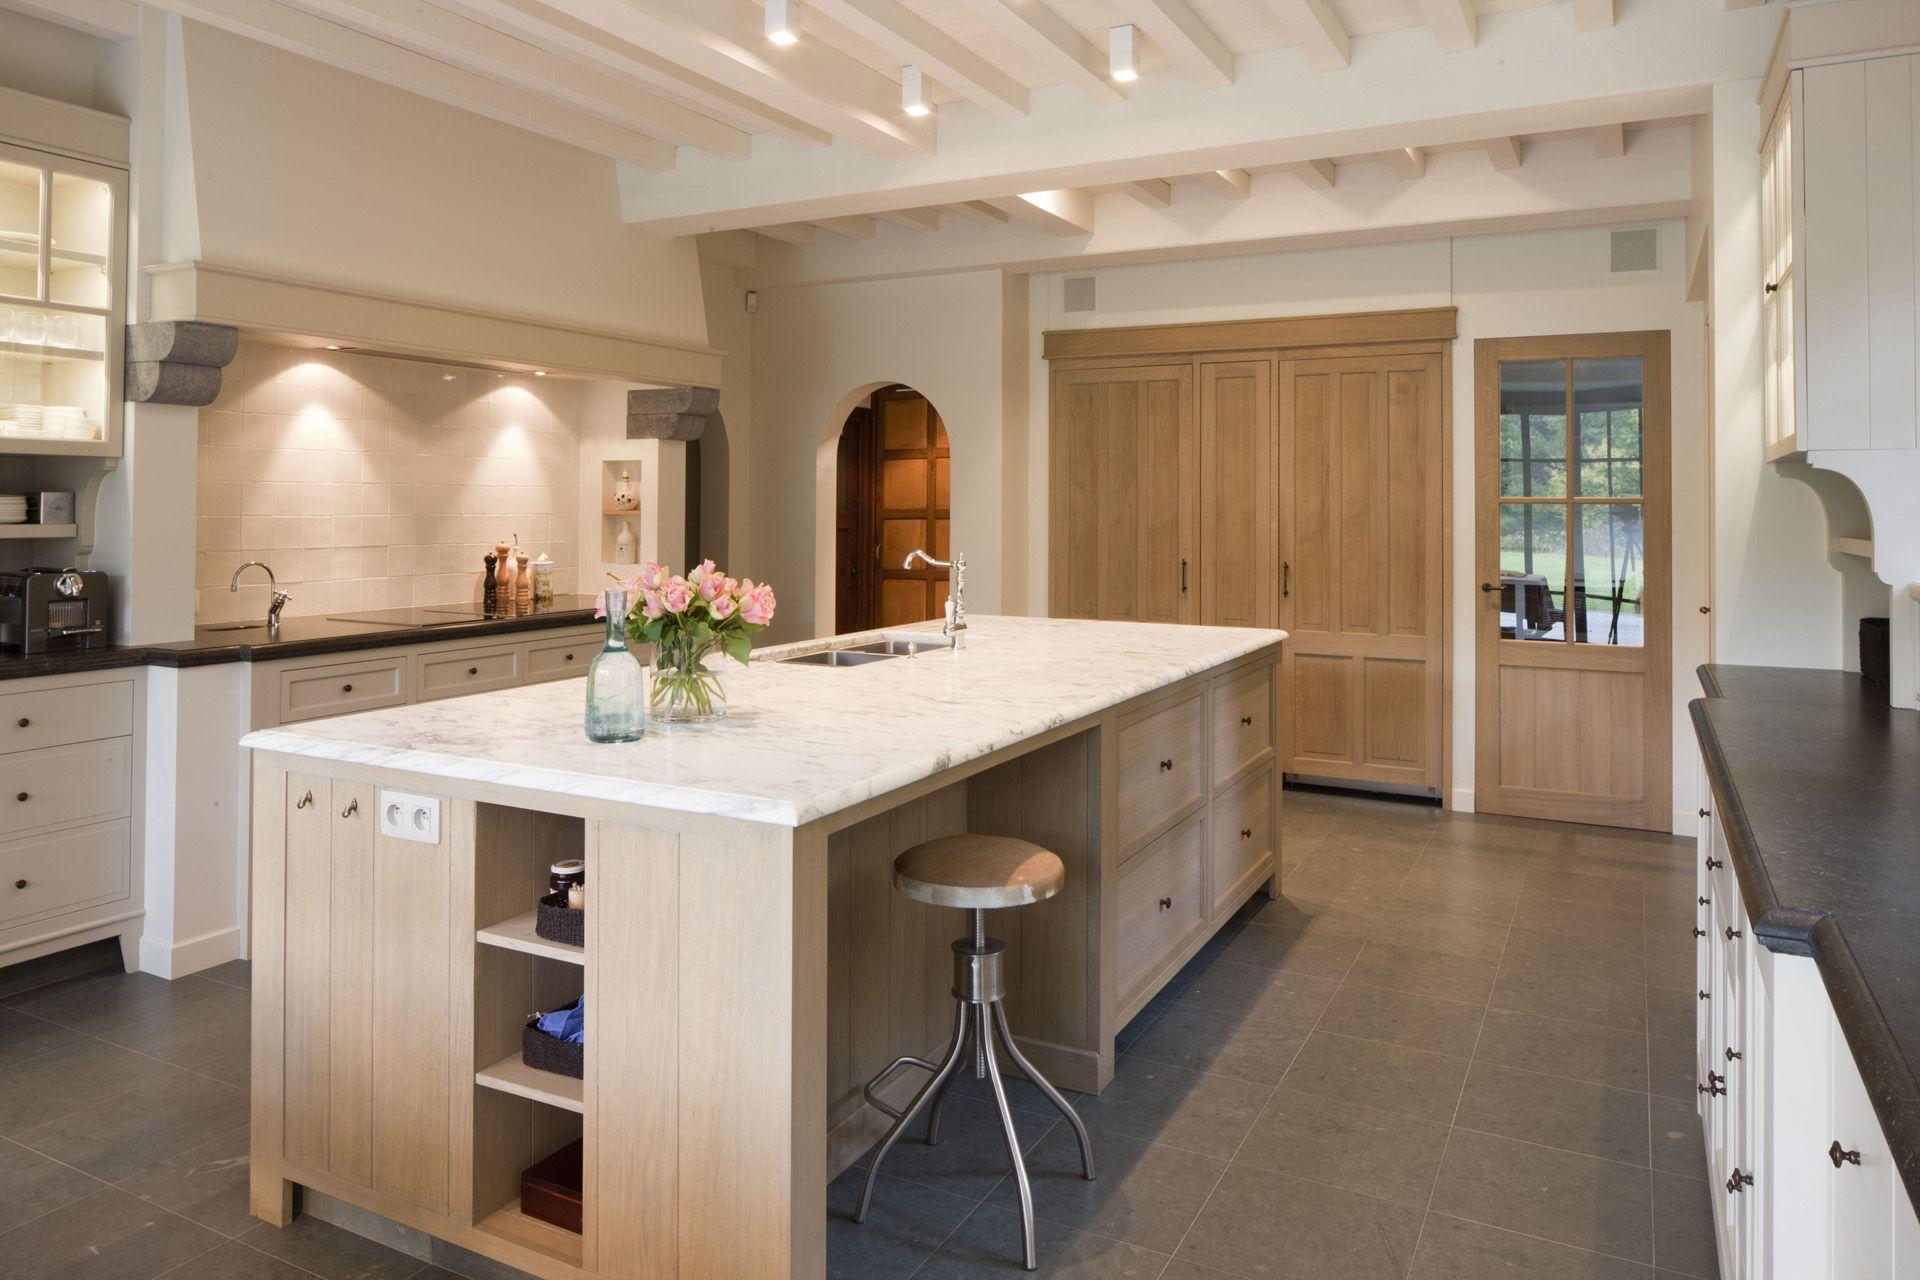 Louis culot keukenwerkbladen in natuursteen marmer klassiek